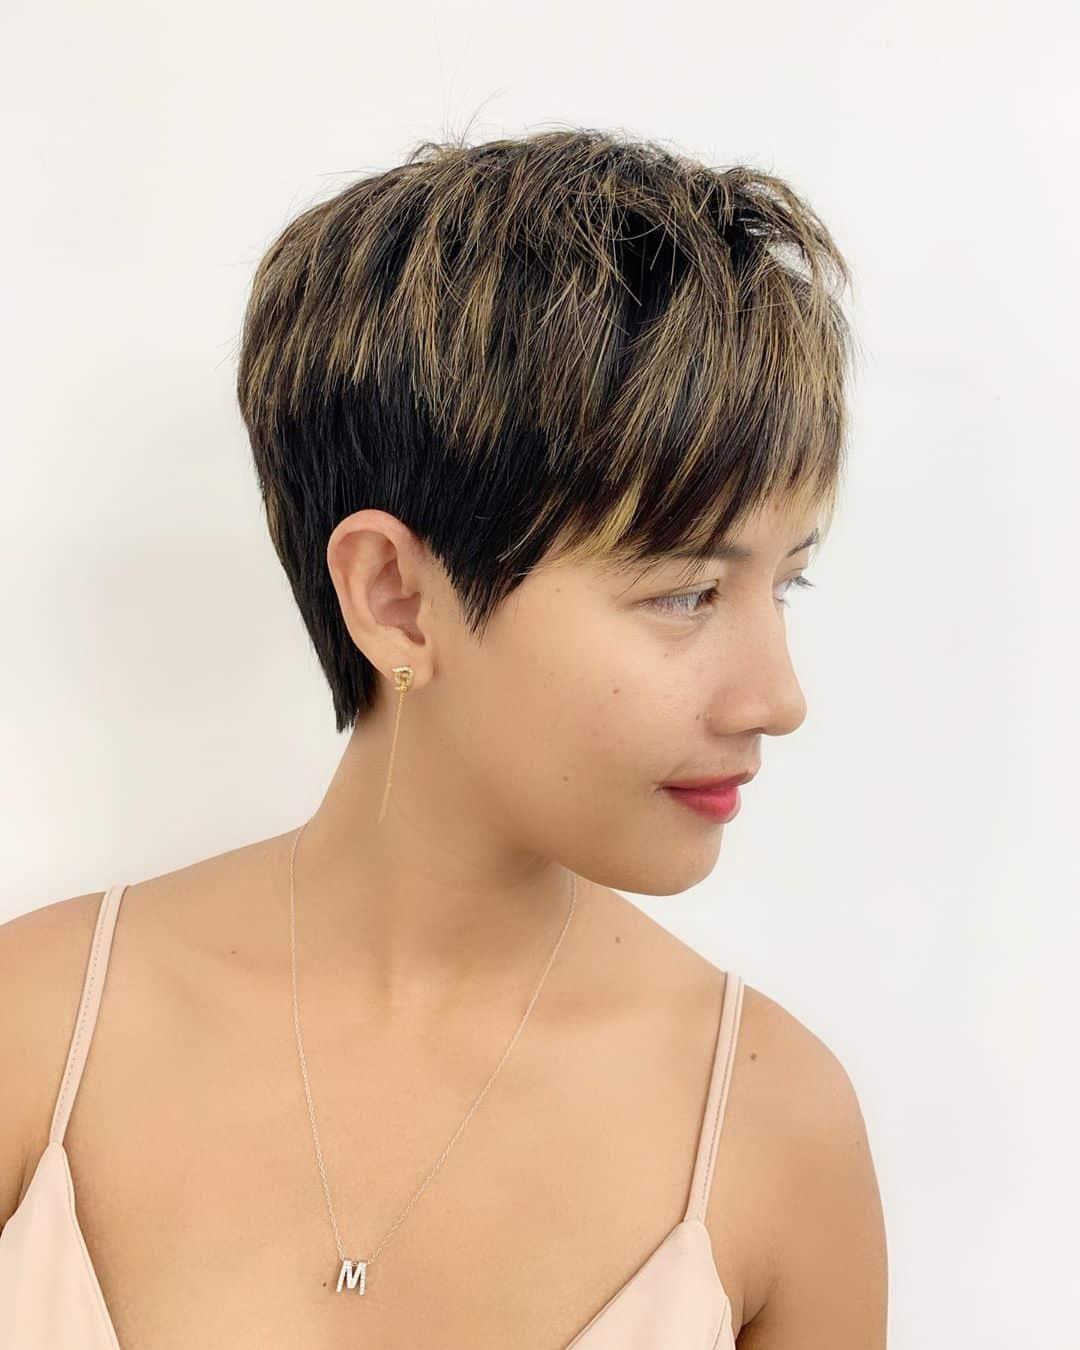 corte de pelo corto para chica asiática con pelo grueso